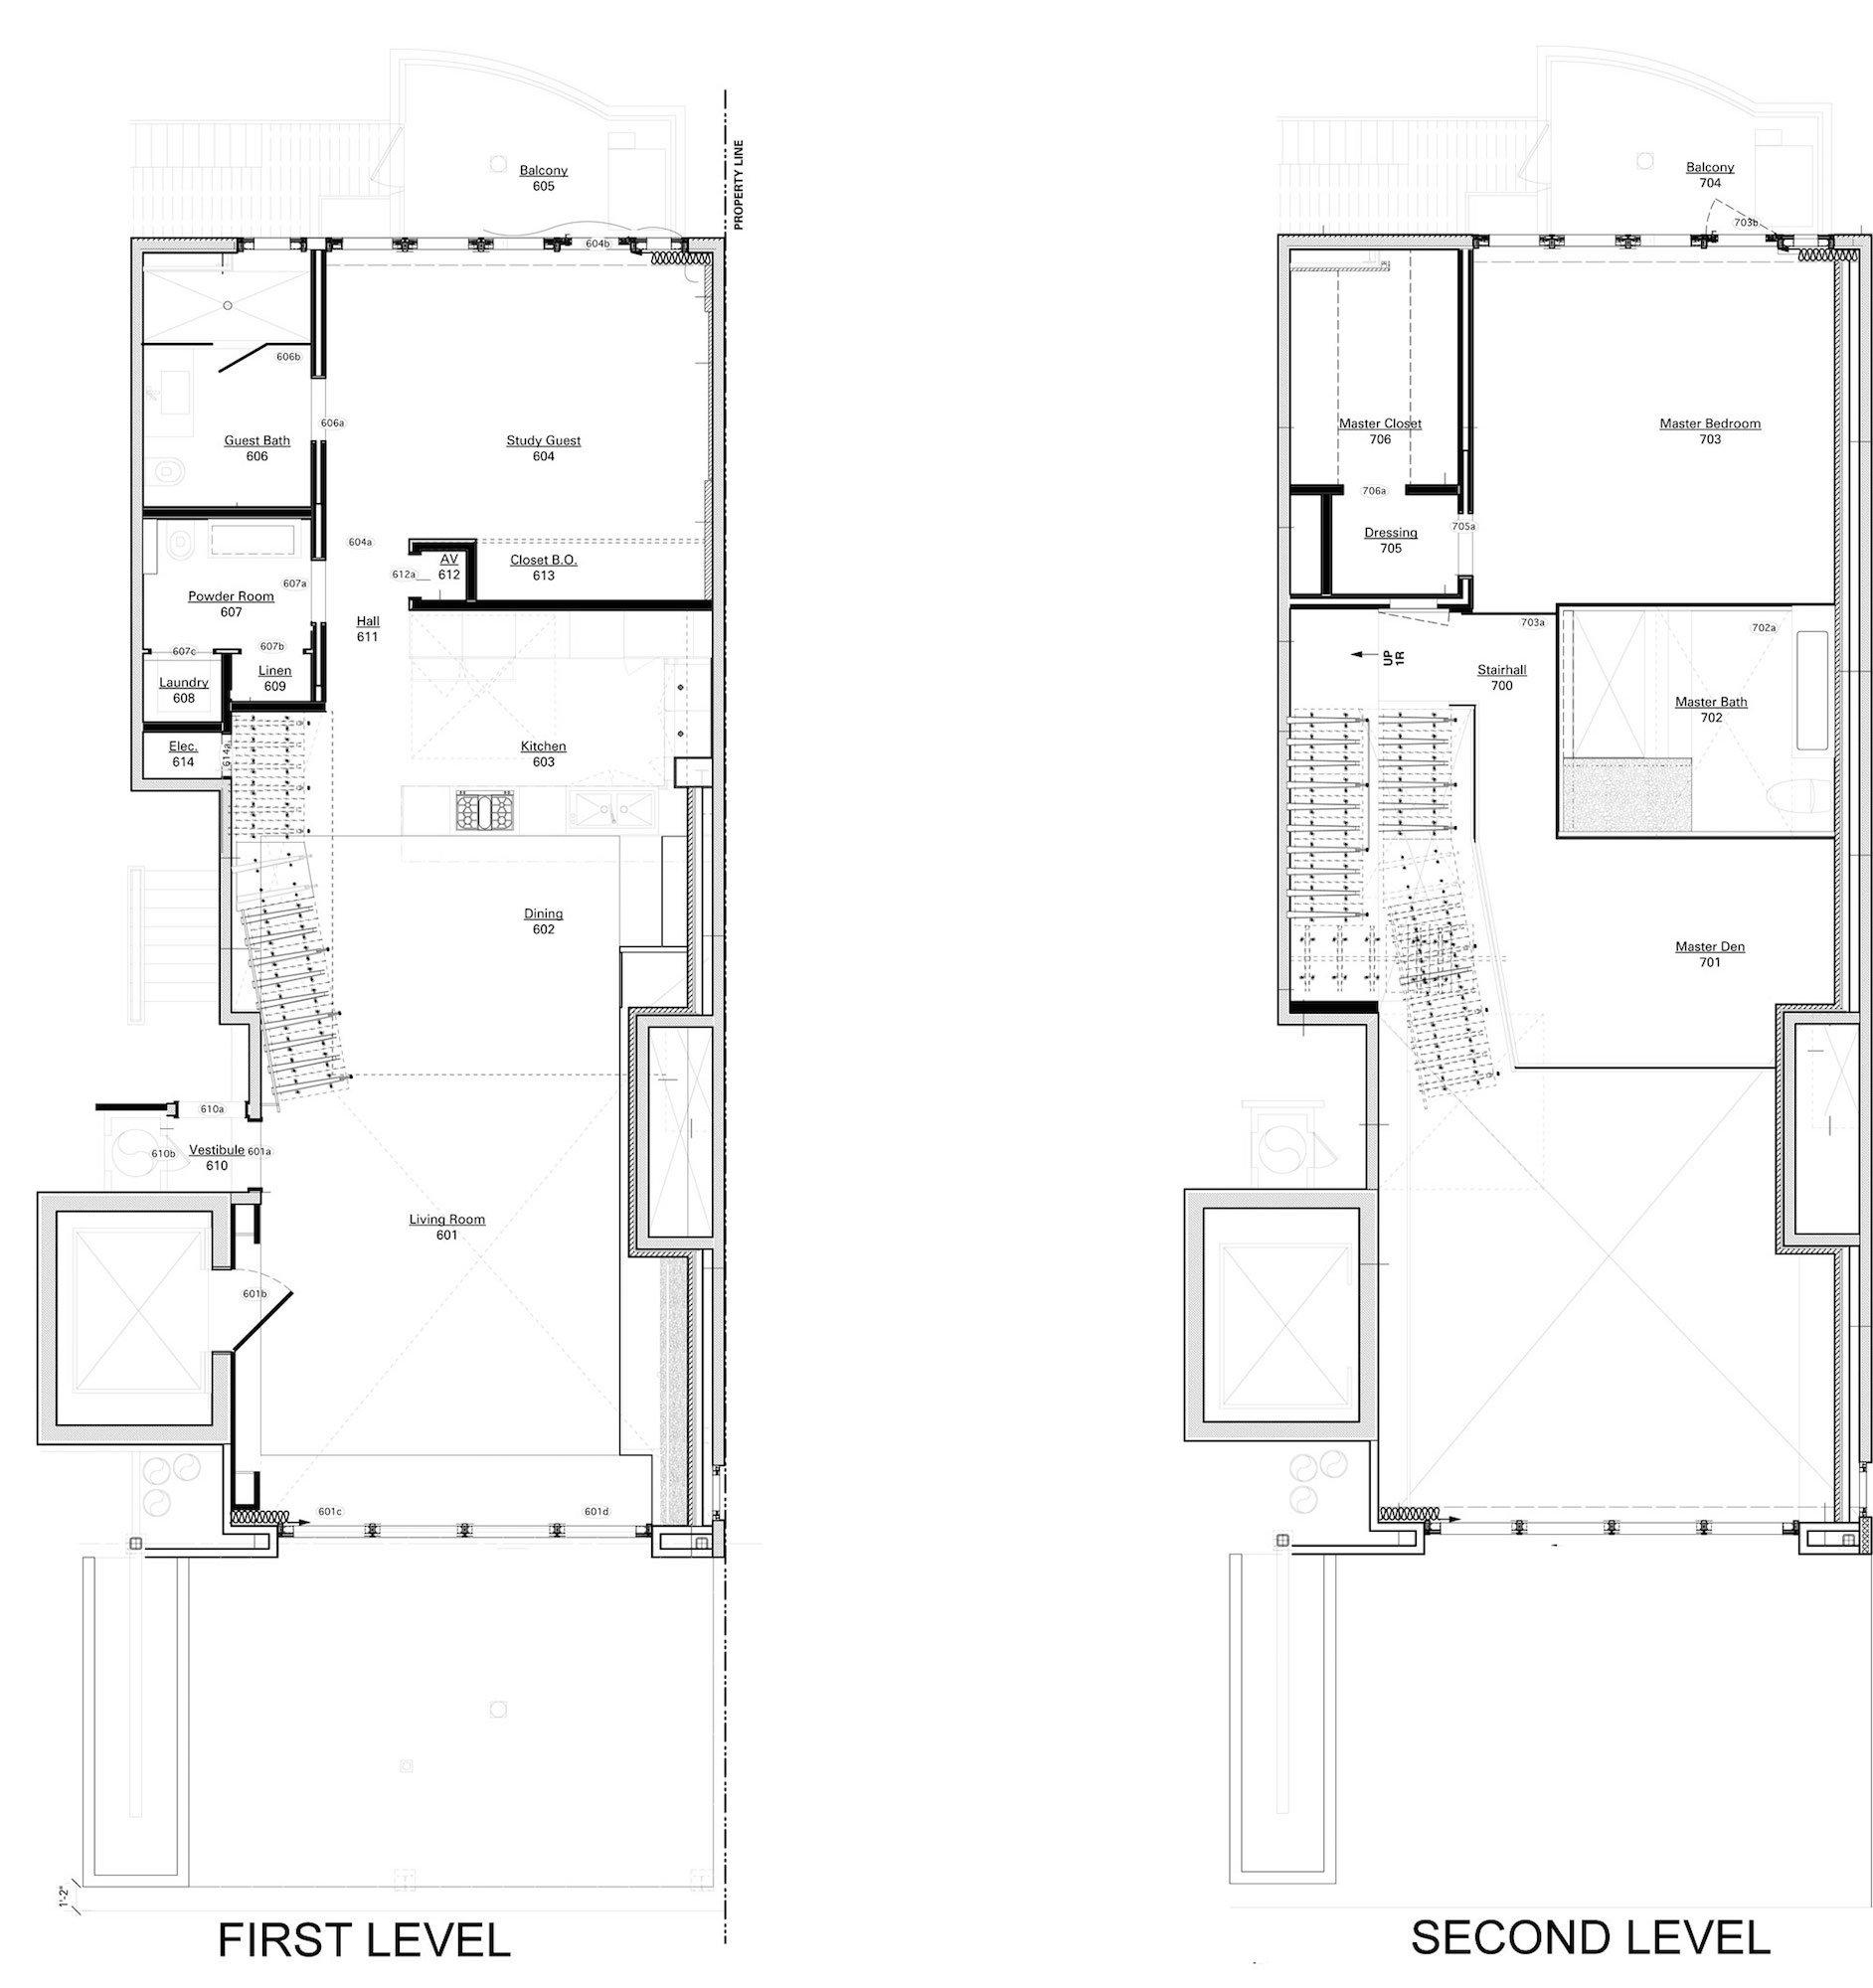 73rd-St-Penthouse-19